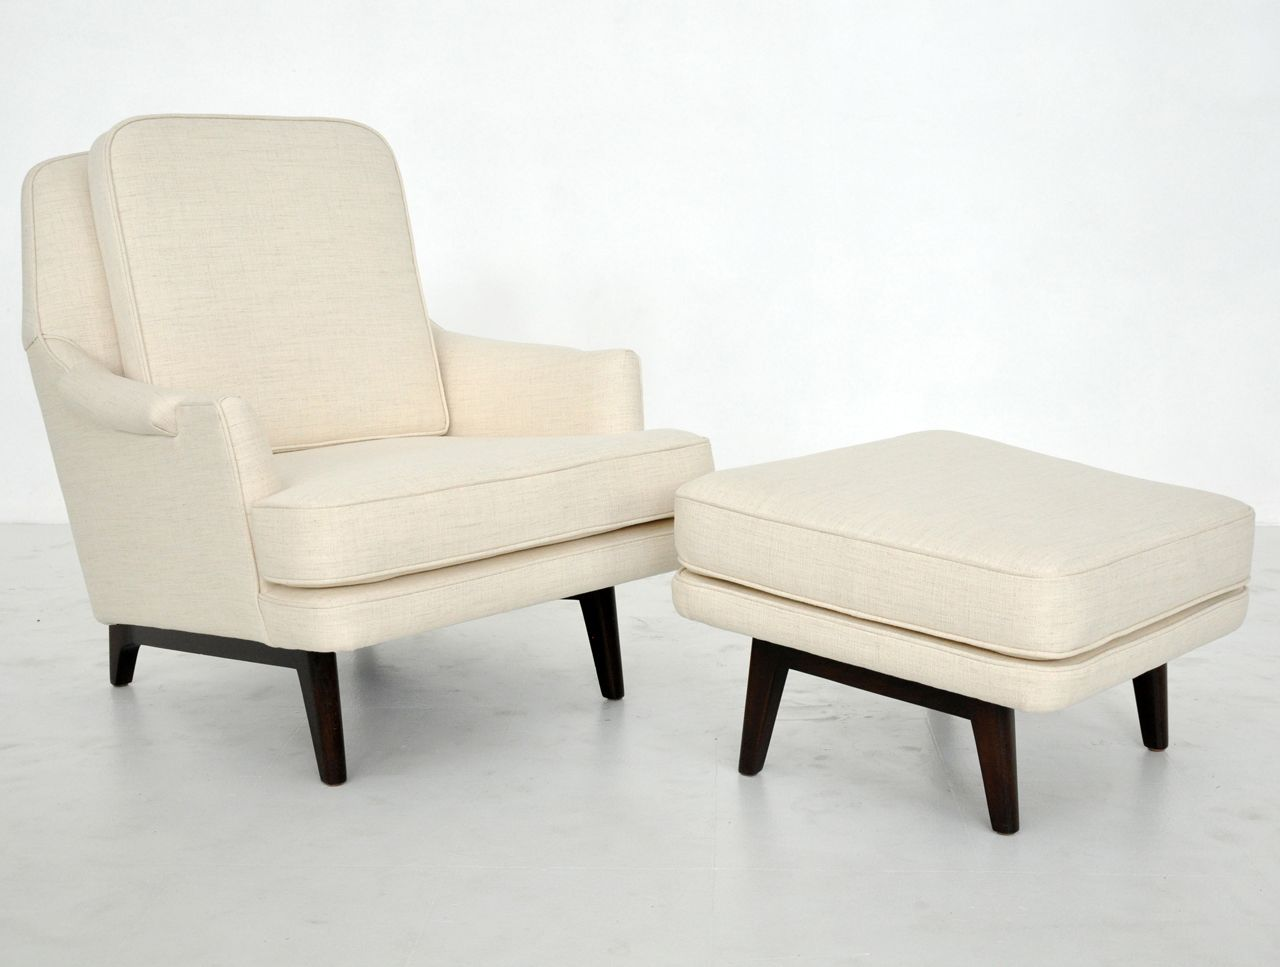 Dunbar Janus Lounge Chair With Ottoman Edward Wormley